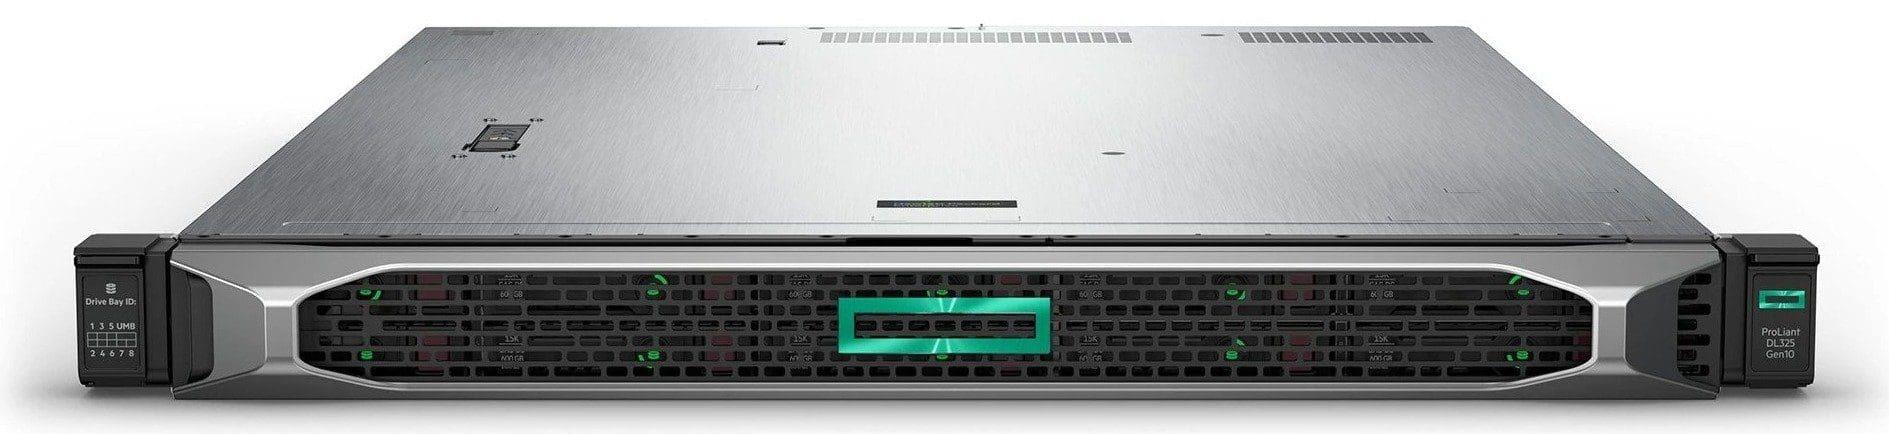 Servidor HPE ProLiant DL325 Gen10